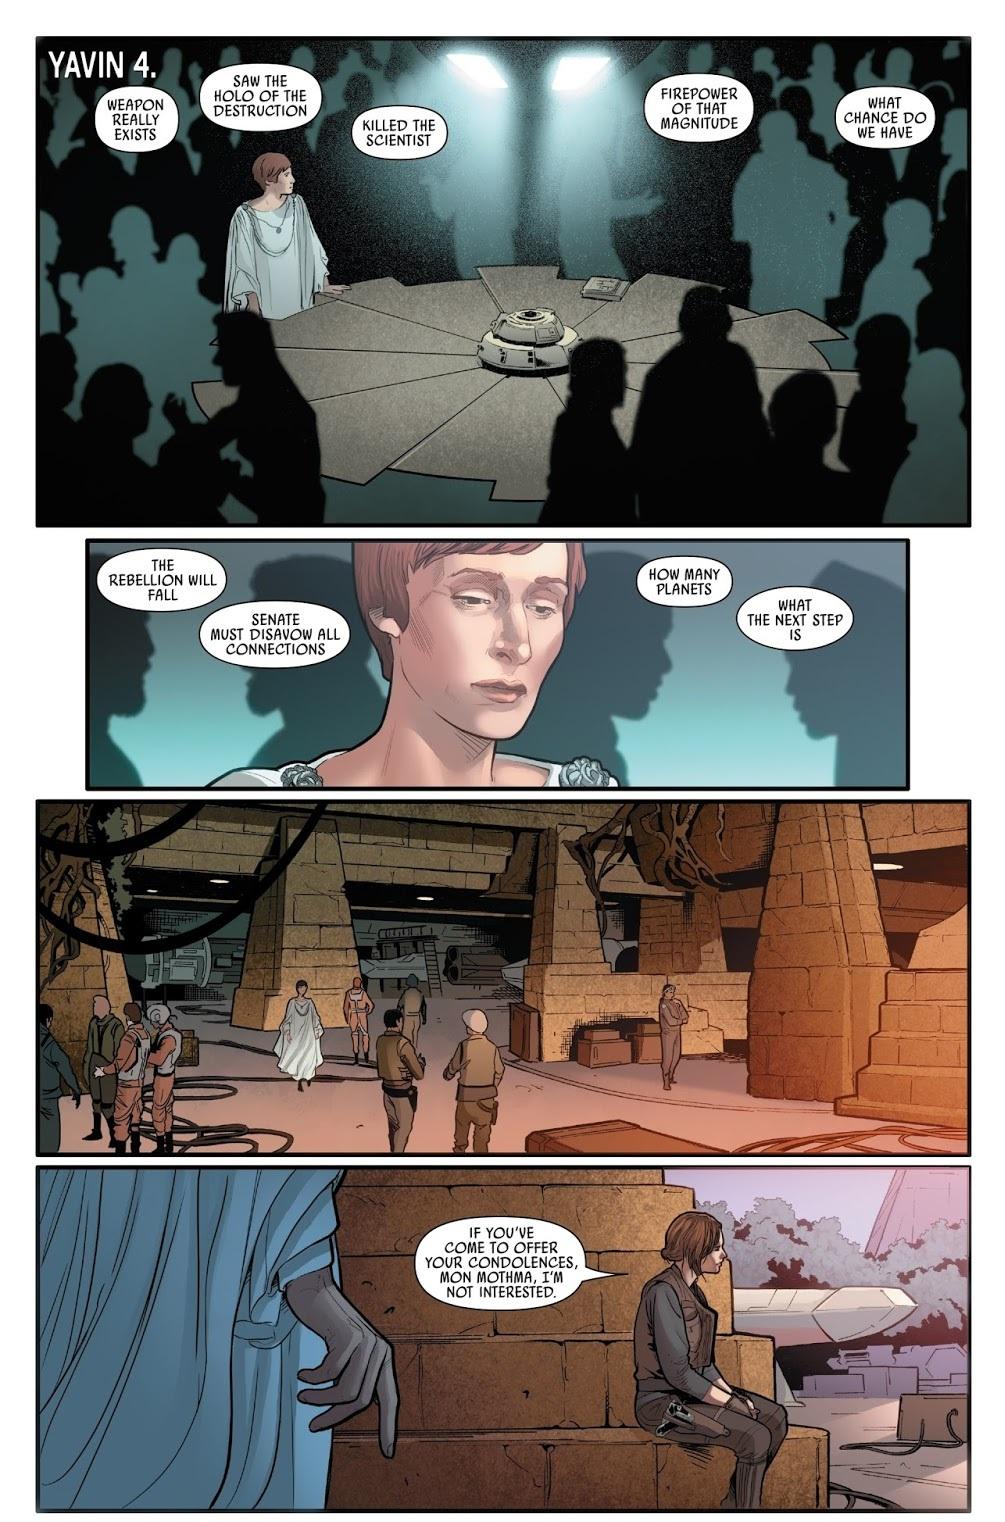 Rogue One Panini Comics 4